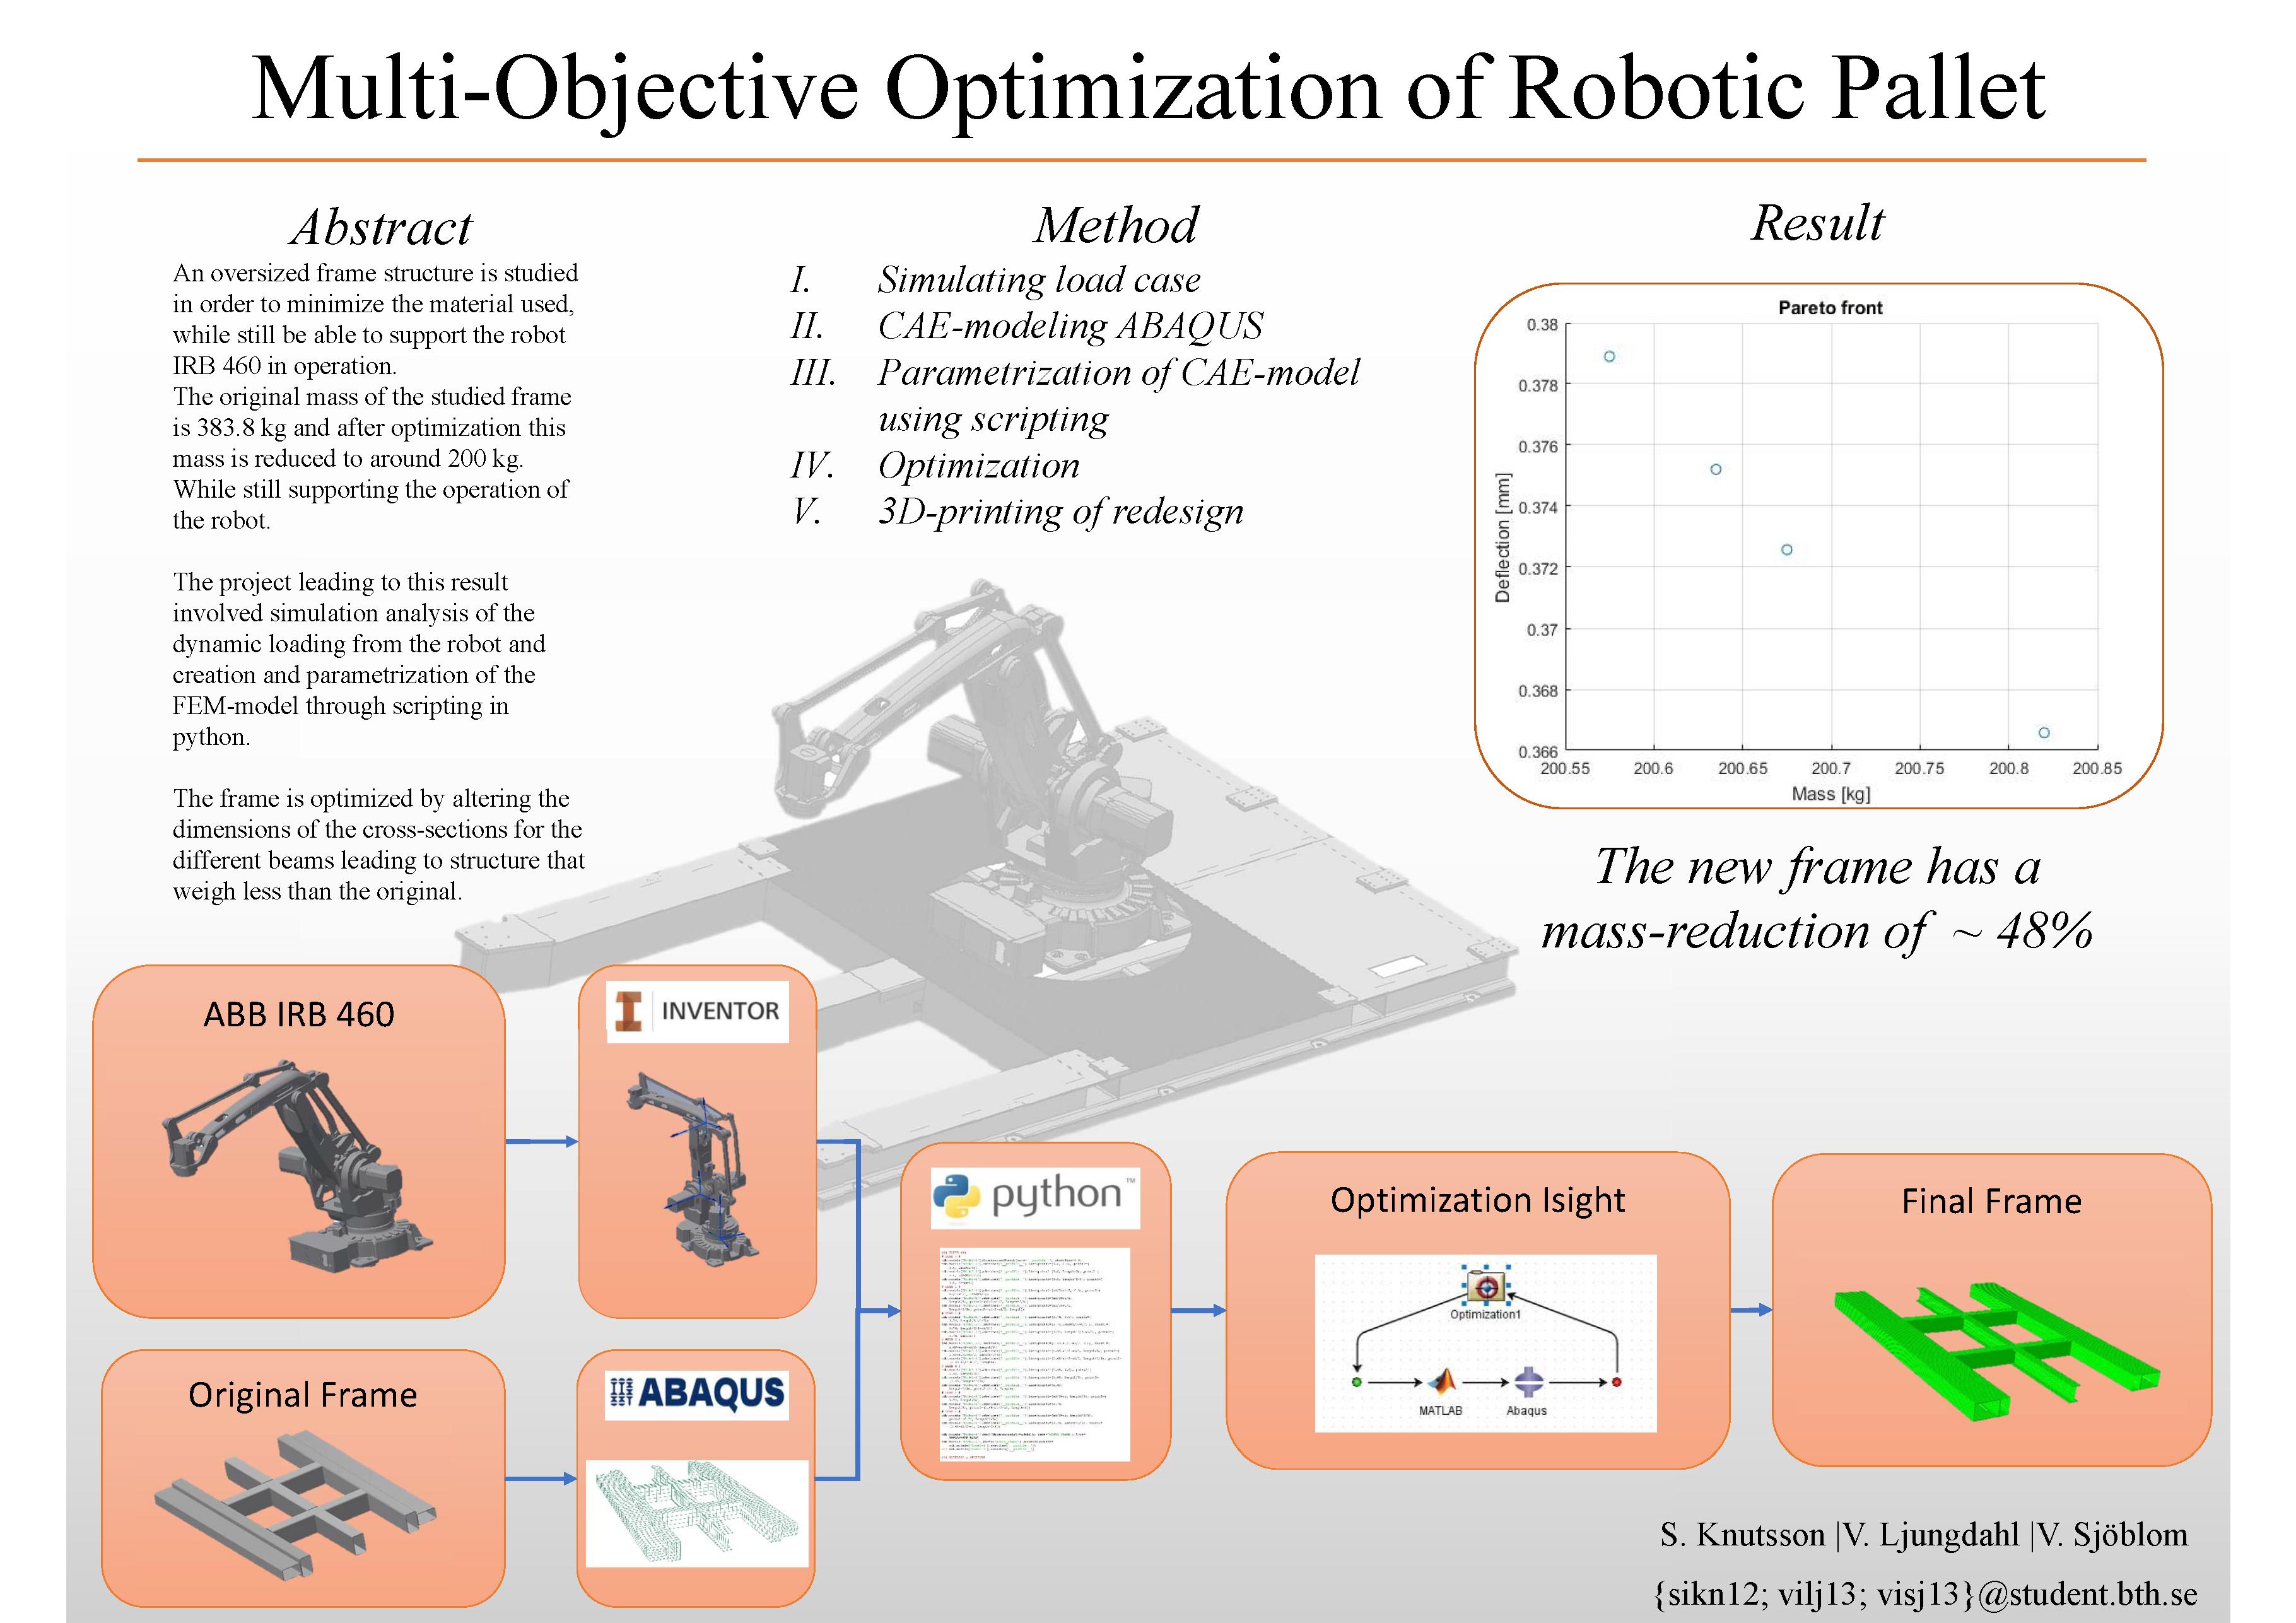 Multi-objective optimization of robotic pallet